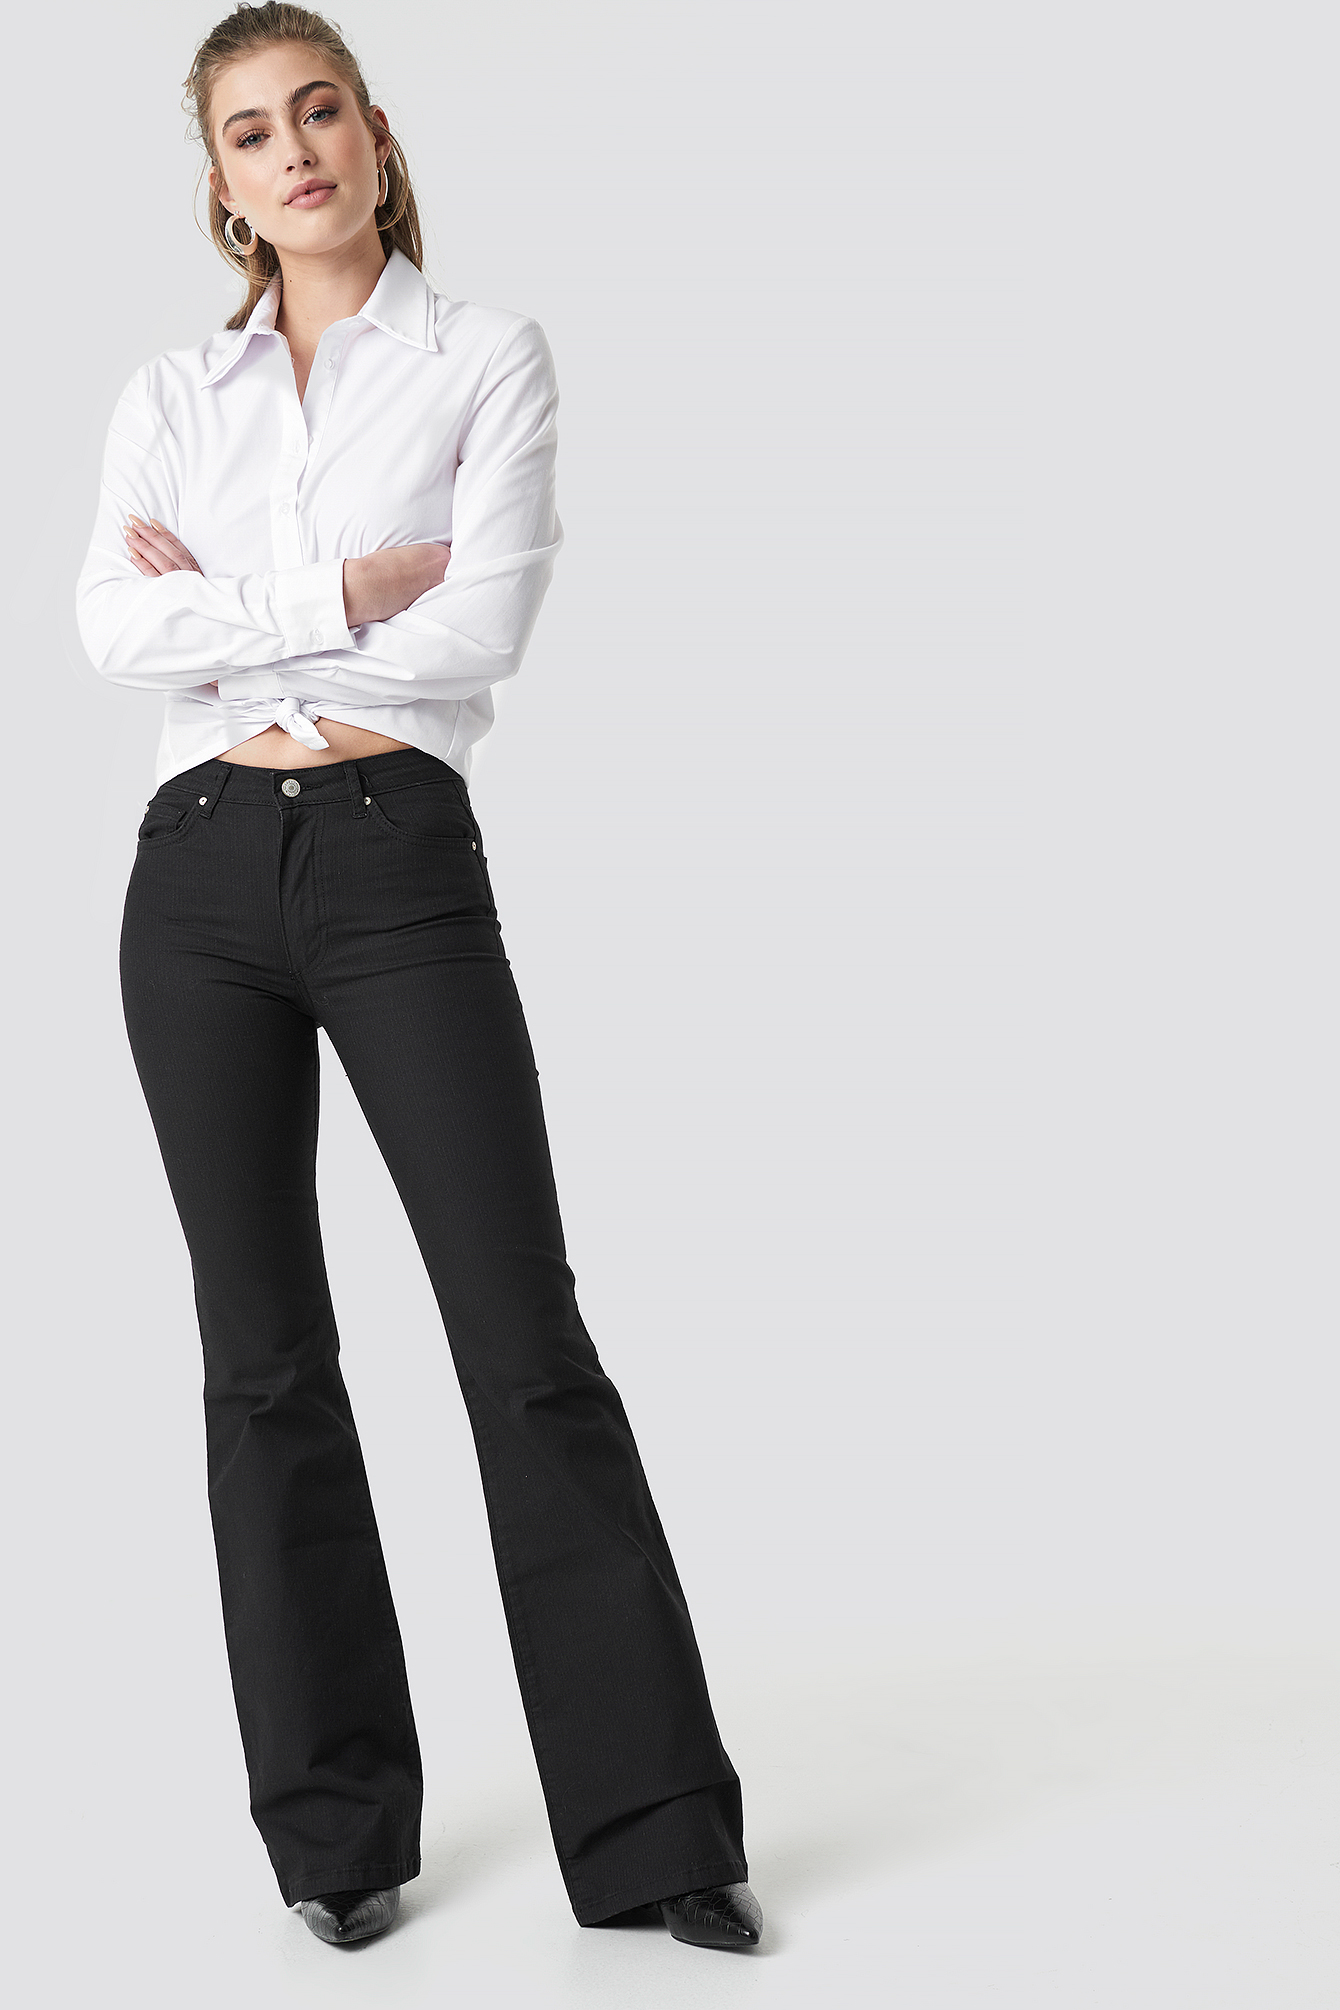 trendyol -  Flared High Waist Jeans - Black